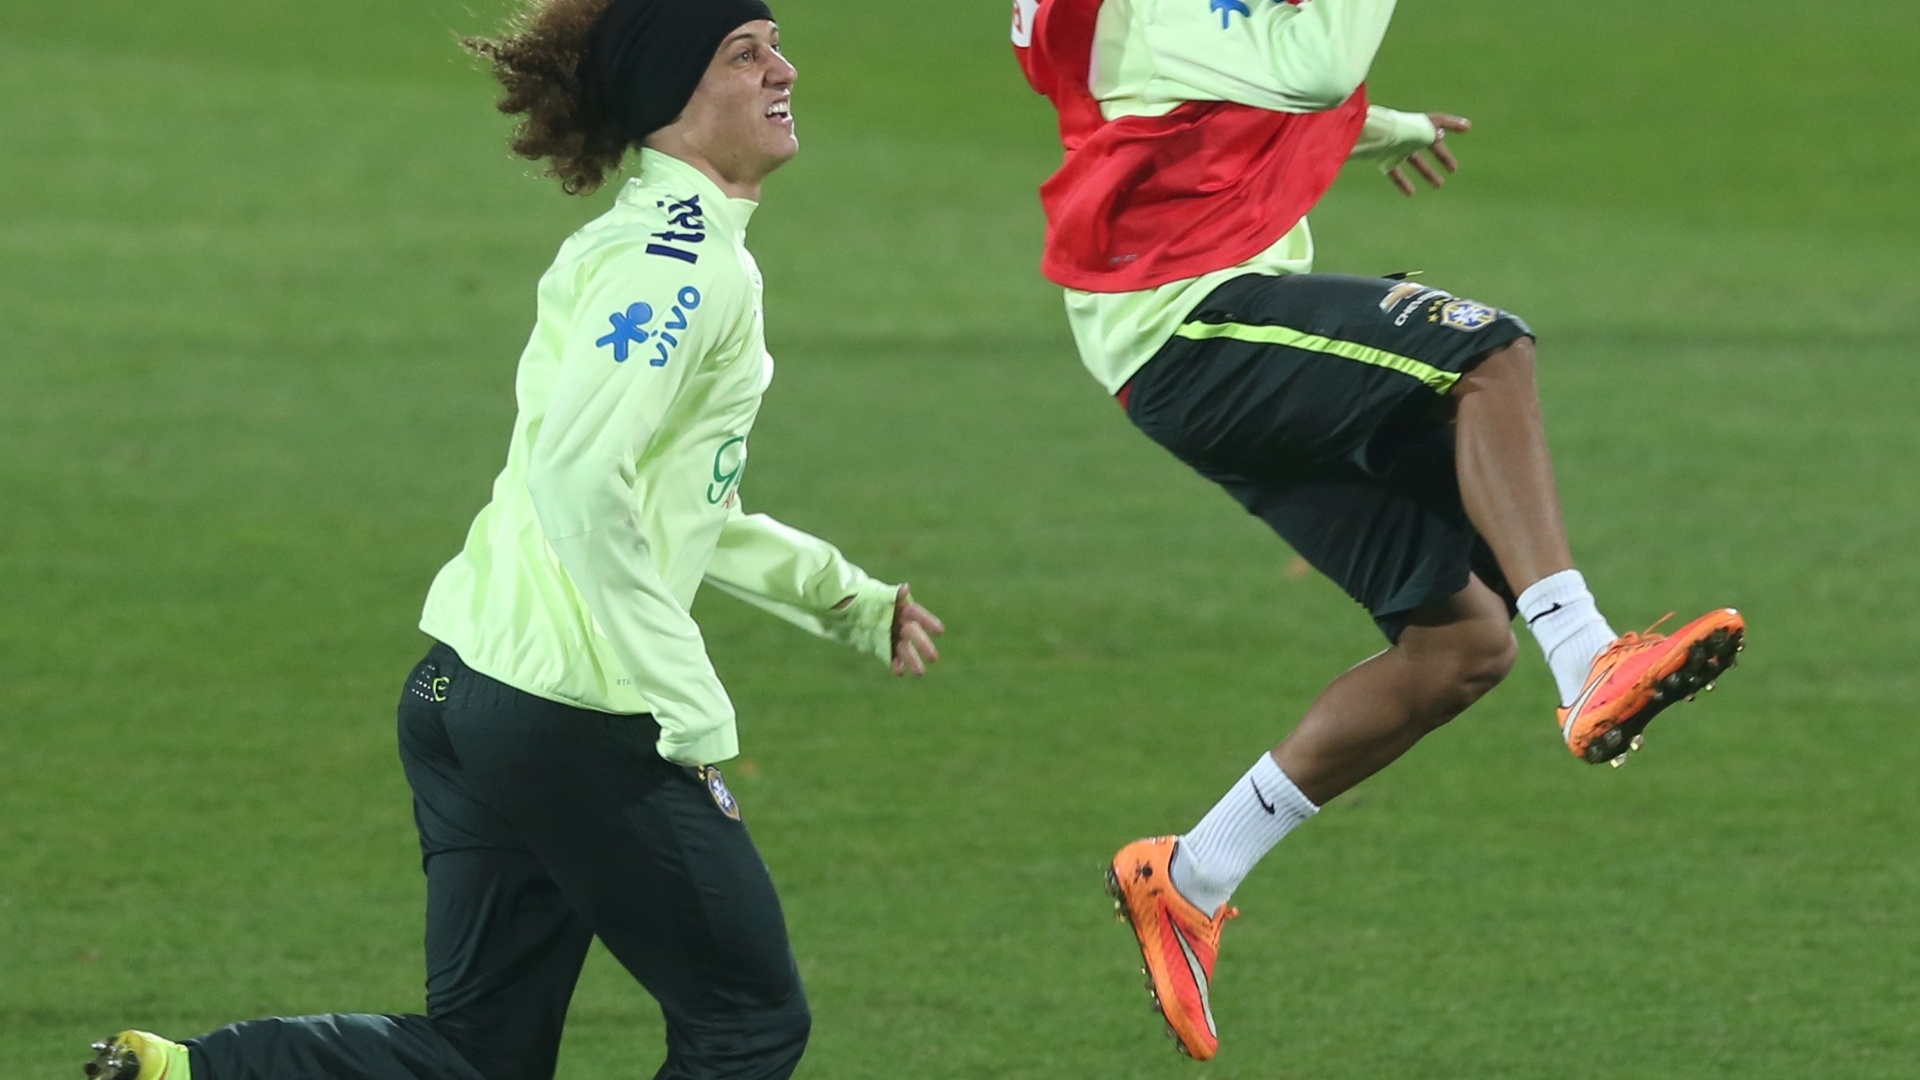 David Luiz e Neymar durante treino do Brasil na Áustria